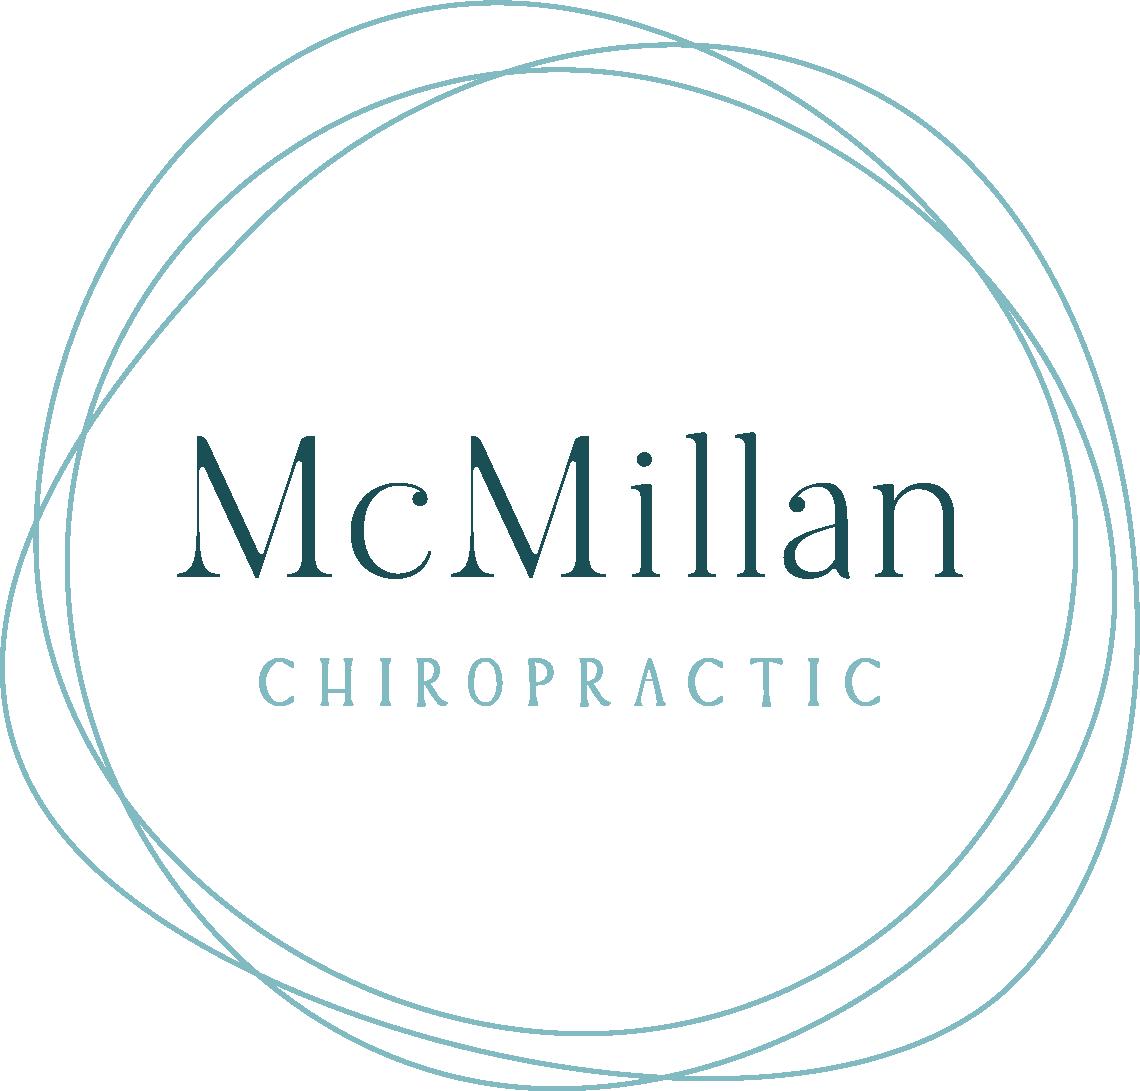 McMillan Chiropractic Centre - Traralgon, VIC 3844 - (03) 5174 9033   ShowMeLocal.com